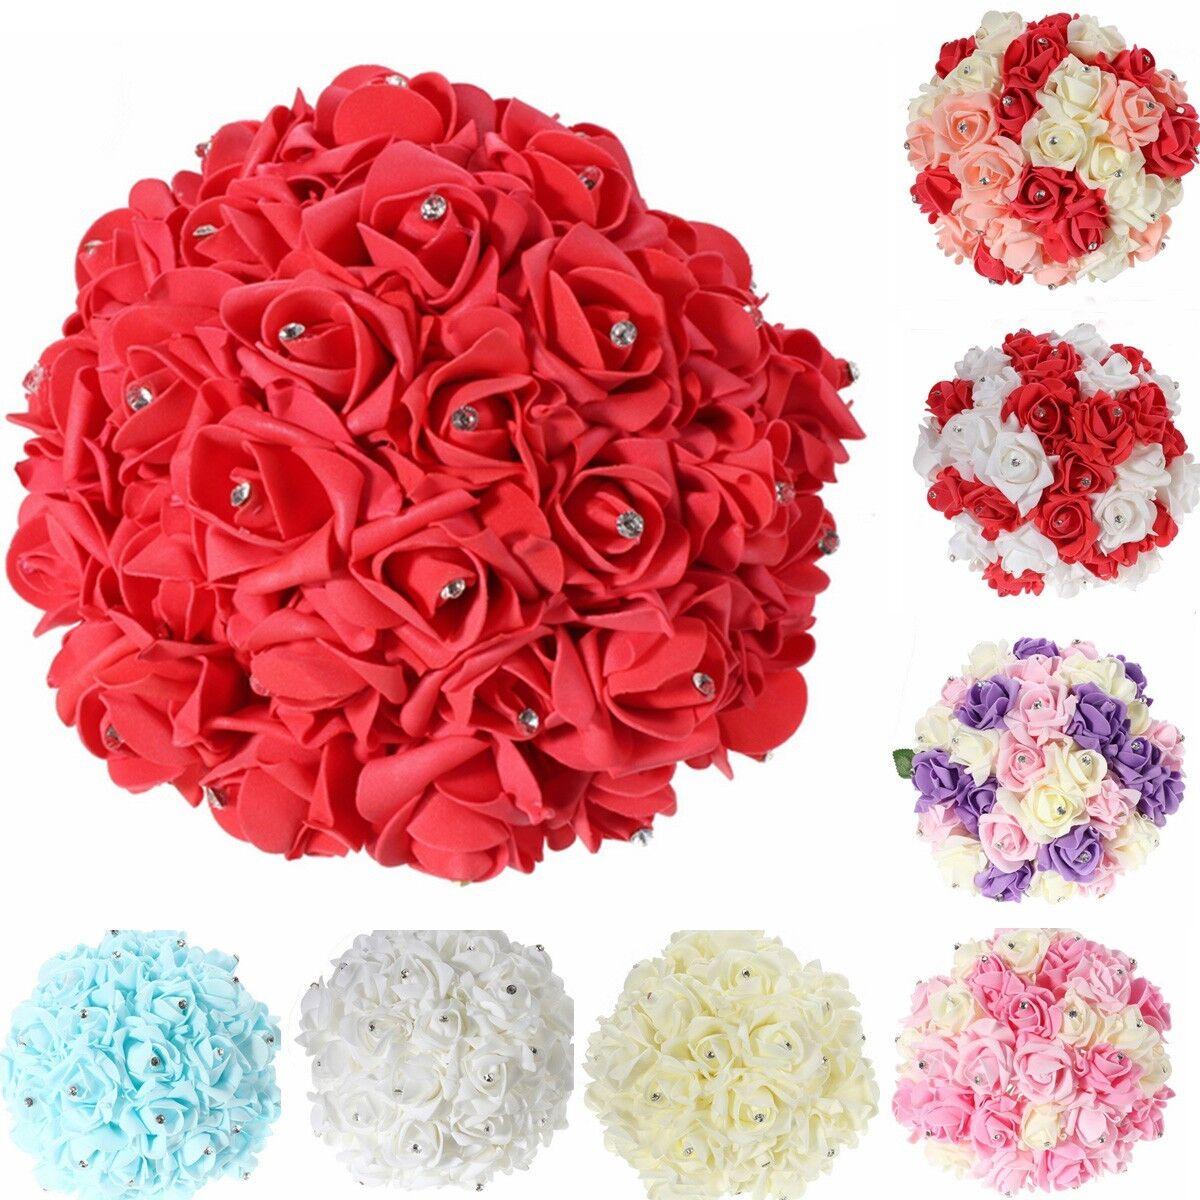 30pcs Crystal Wedding Bridal Bridesmaid Flower Craft Foam Roses Bouquet Posy US